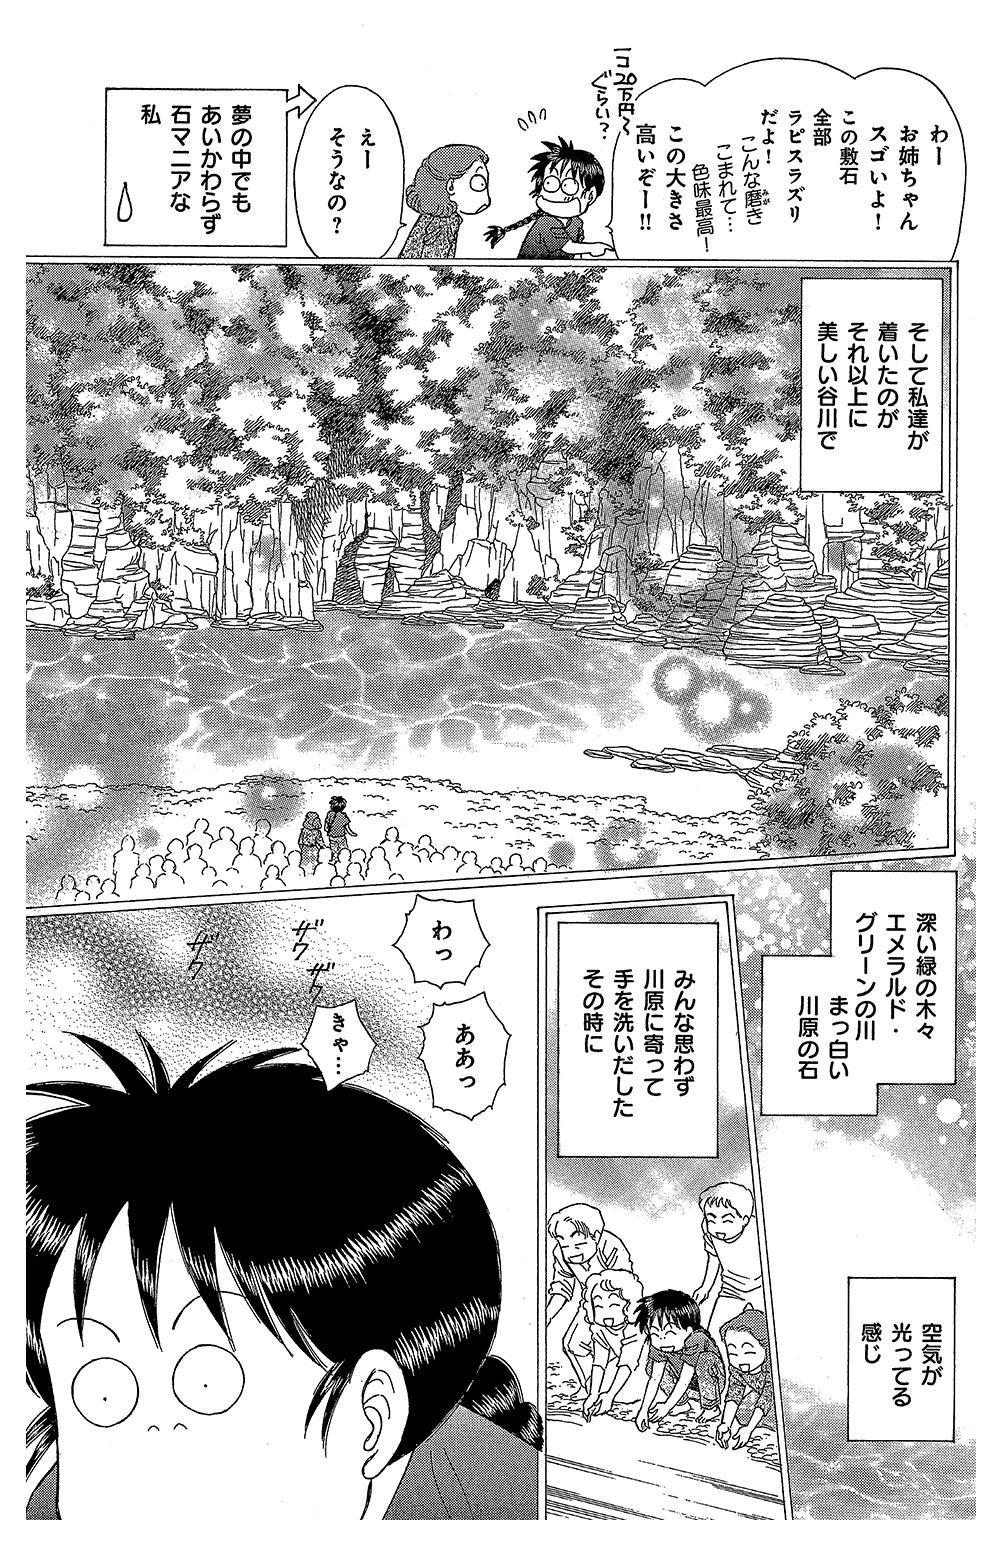 okaruto2-1-9.jpg